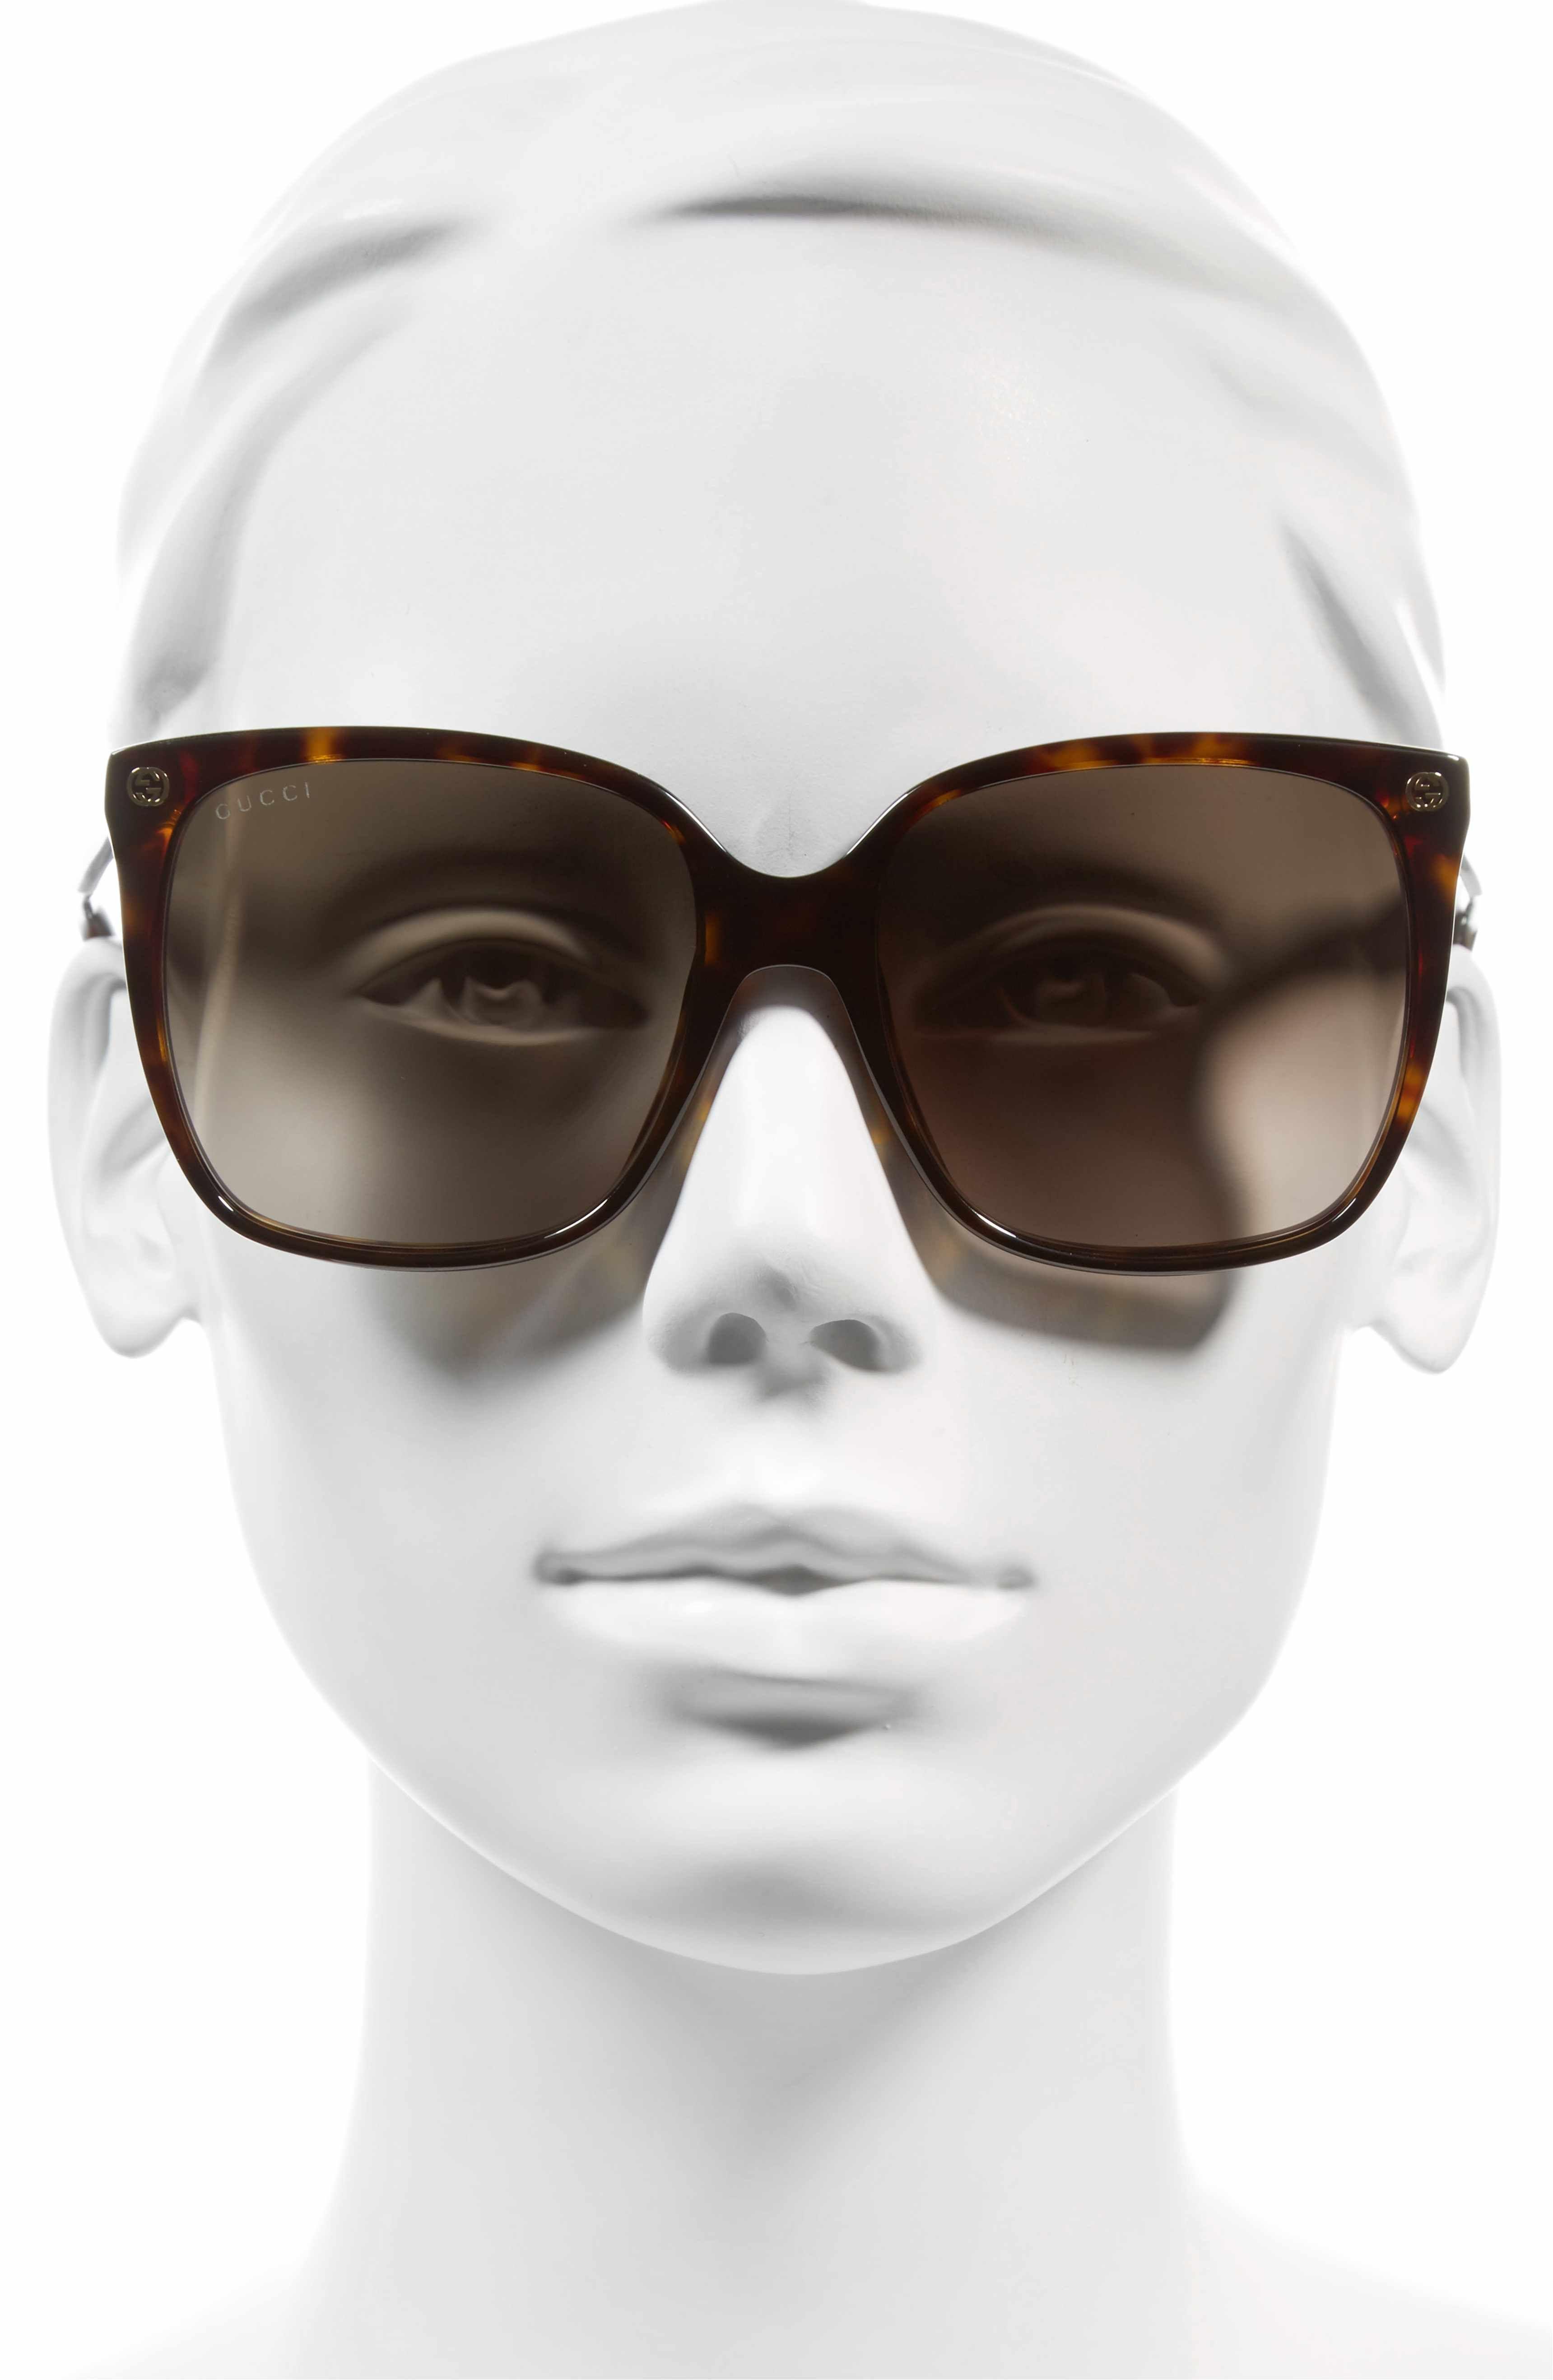 b88e361f2 Main Image - Gucci 57mm Square Sunglasses | sunshades | Sunglasses ...